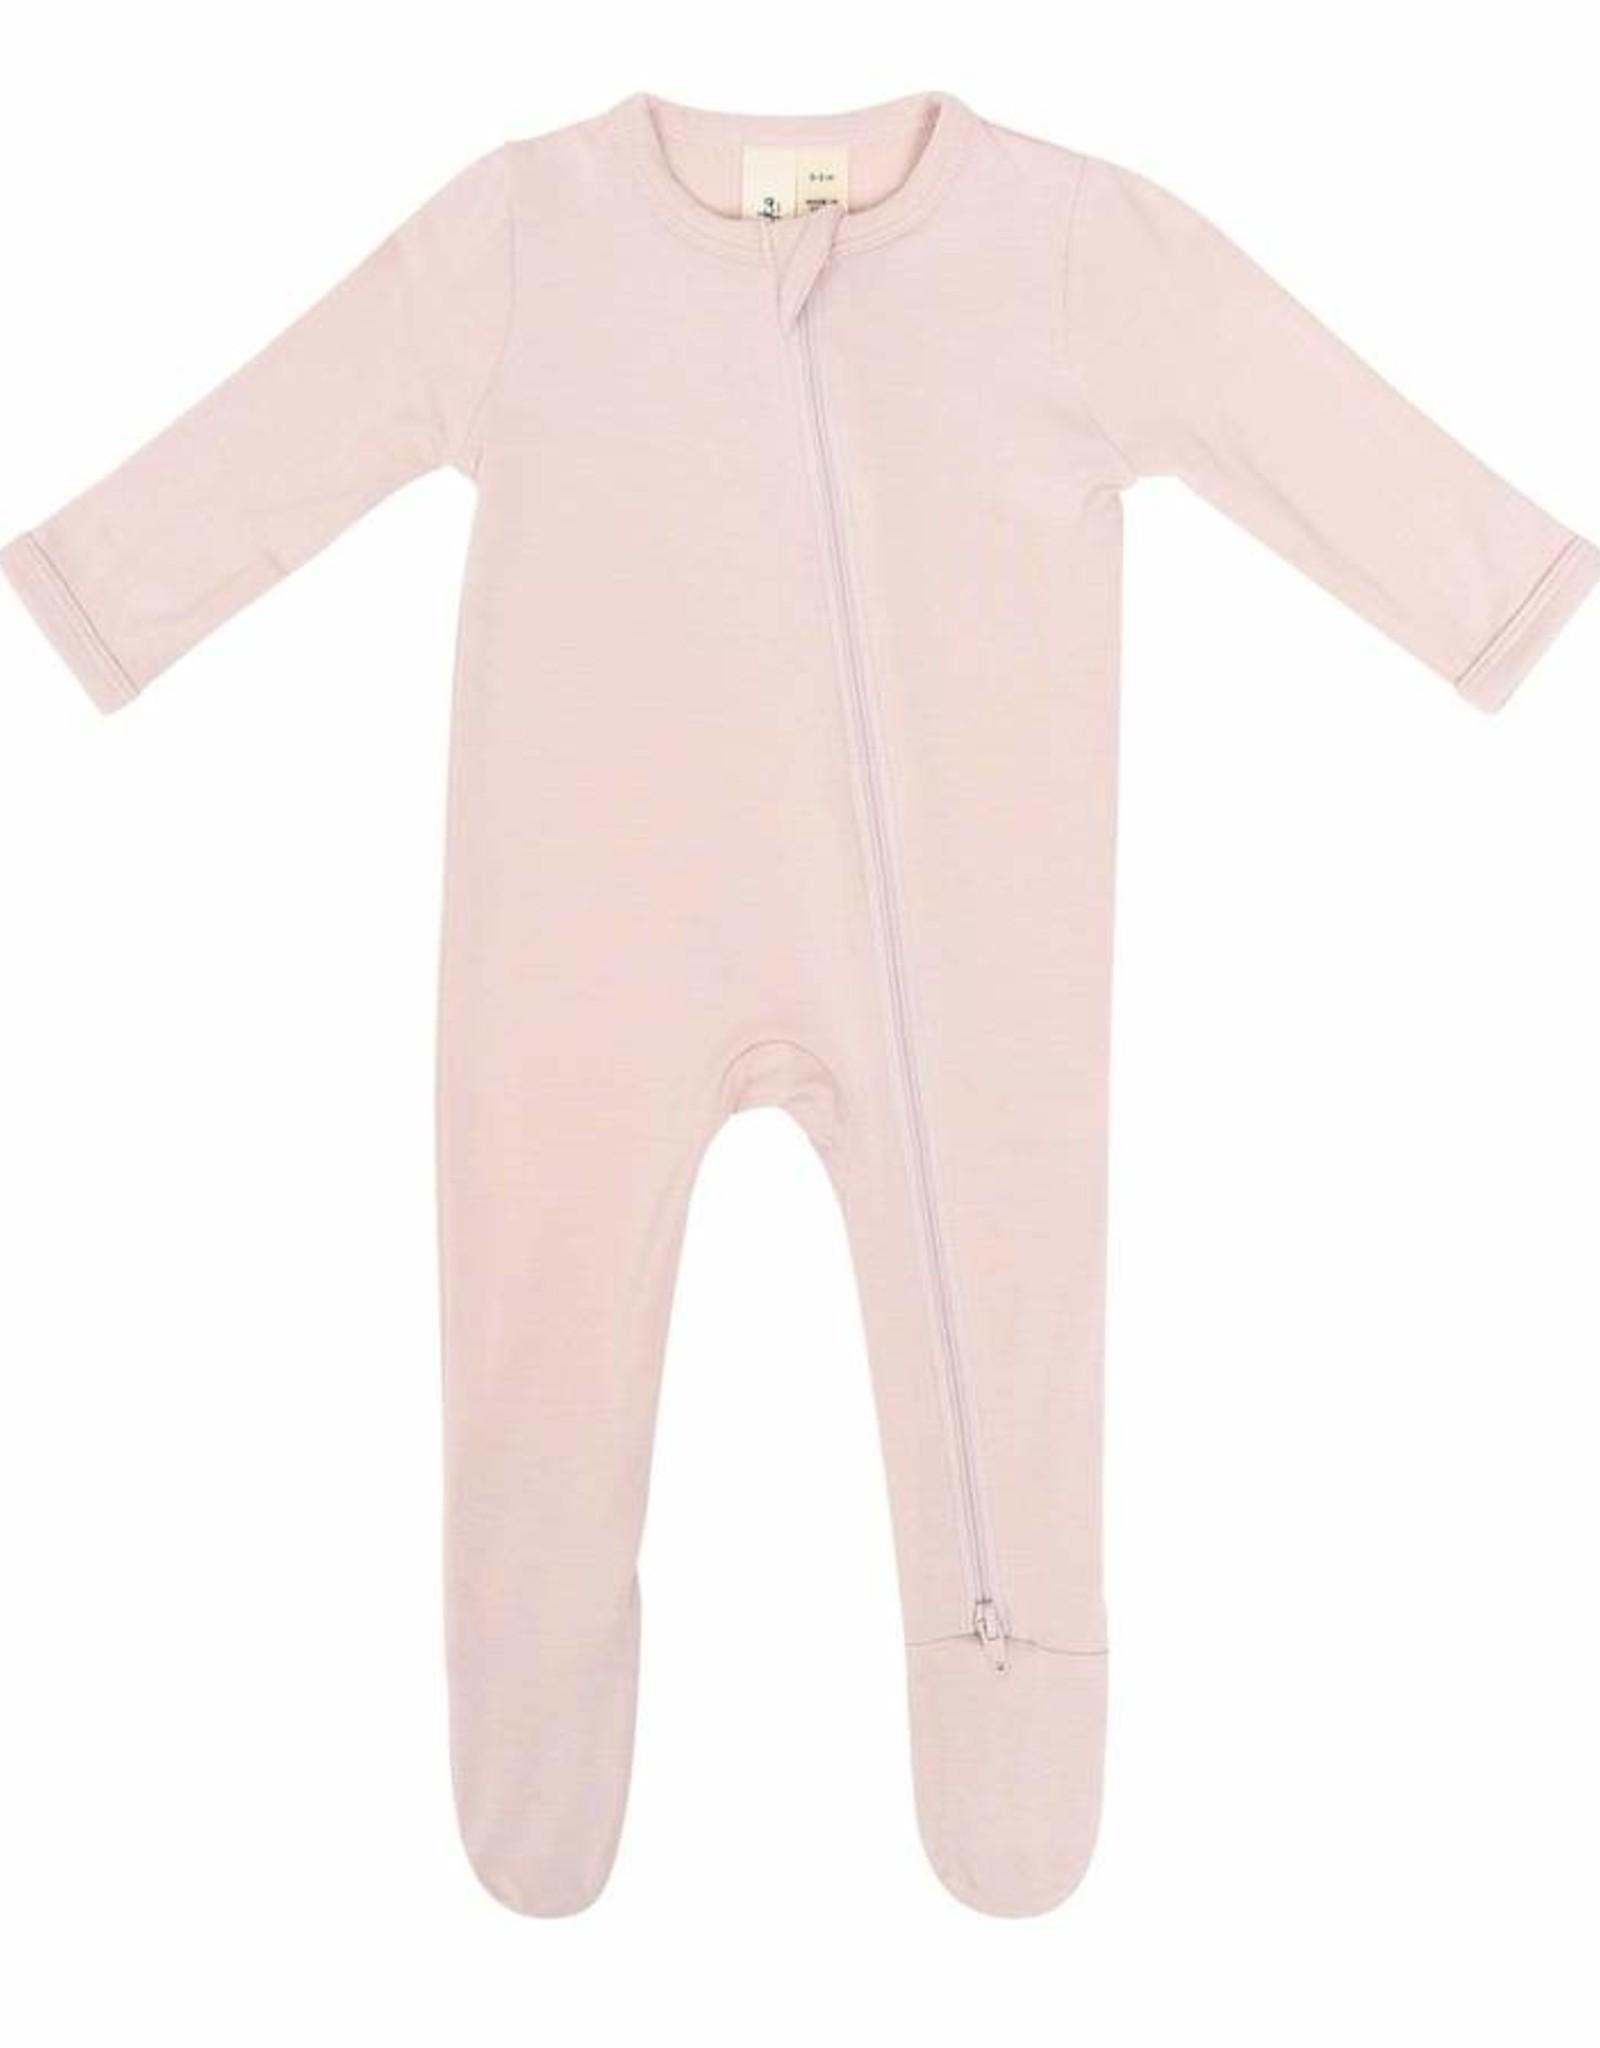 Kyte Baby zippered footie- blush